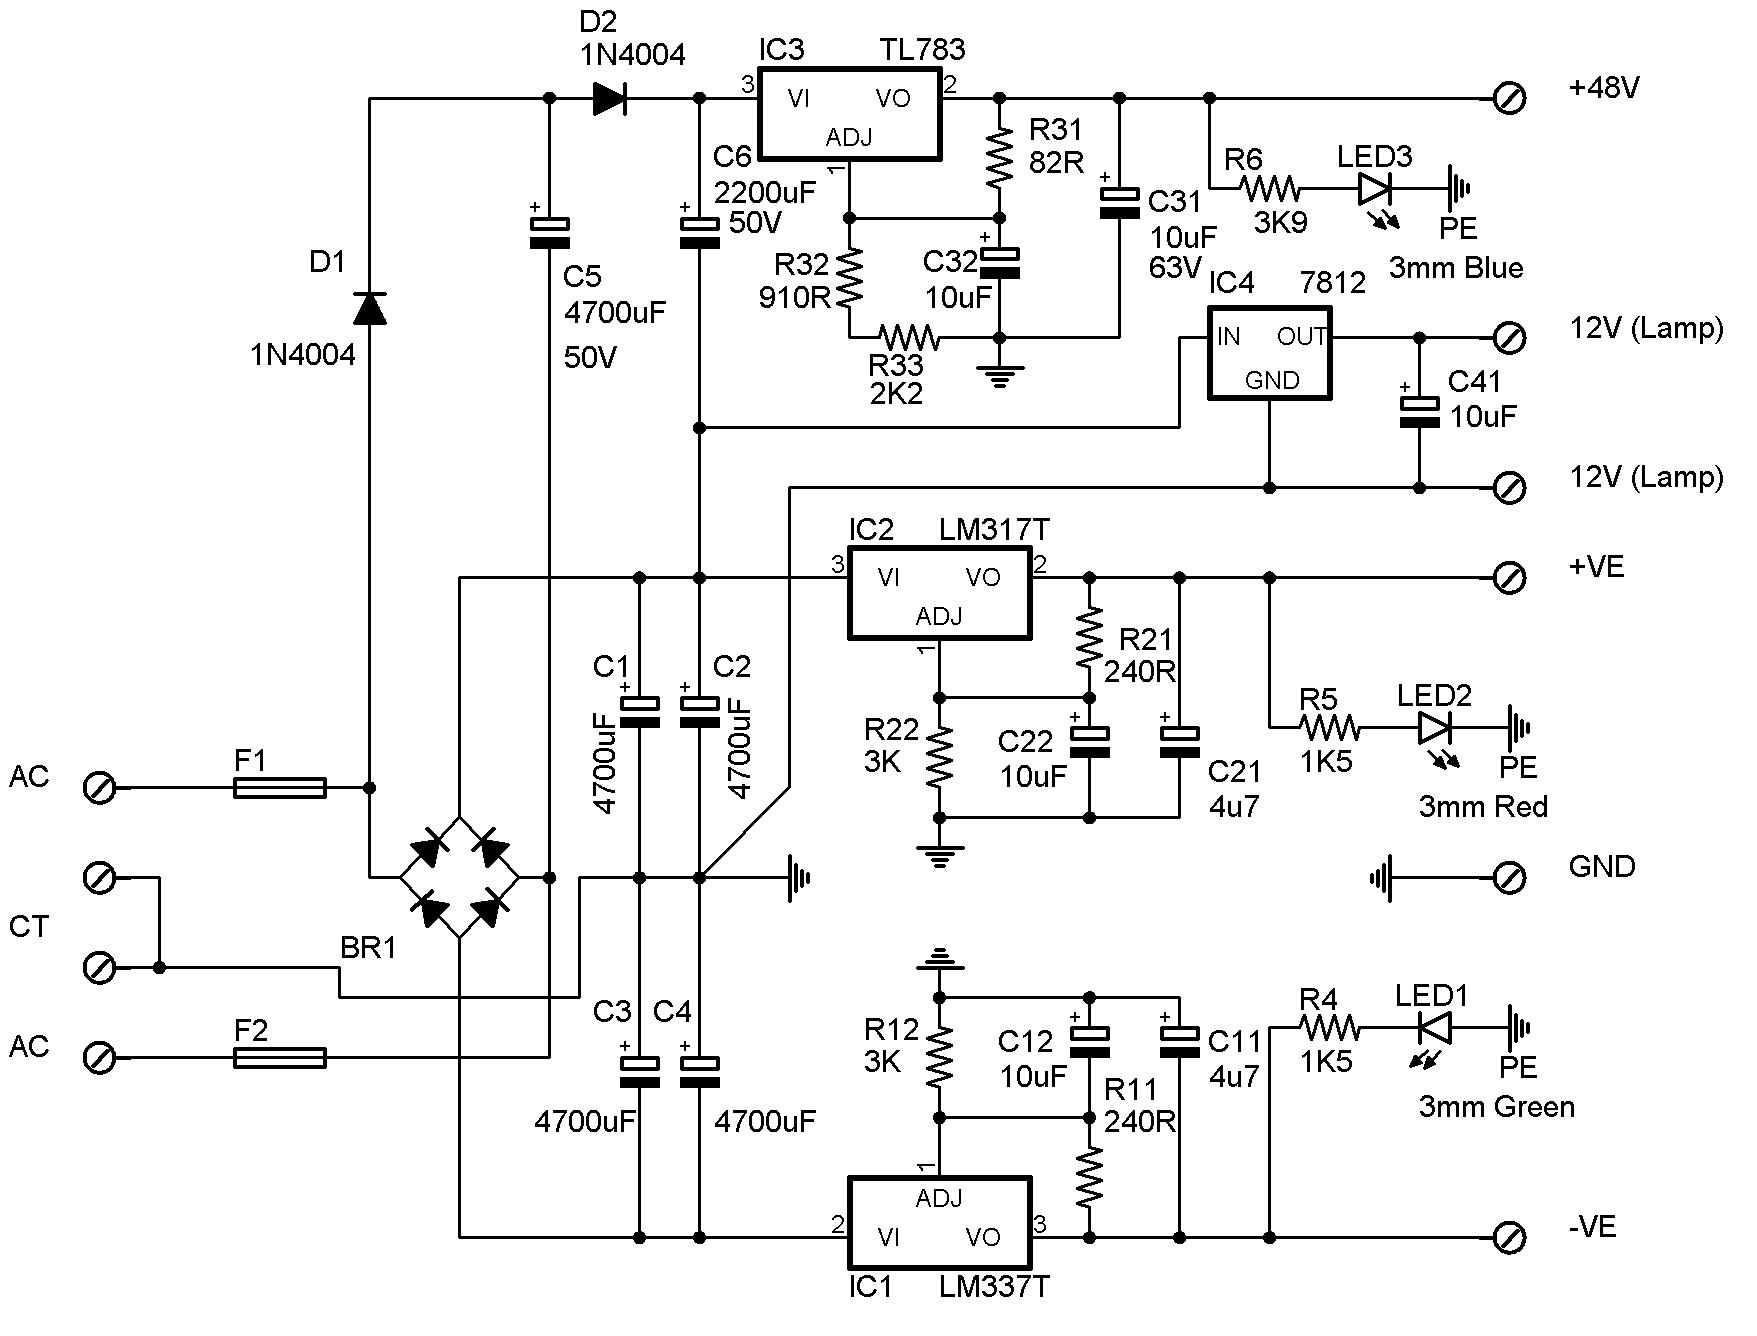 Small Desk Supply Phantom Power Schematic Circuit Description